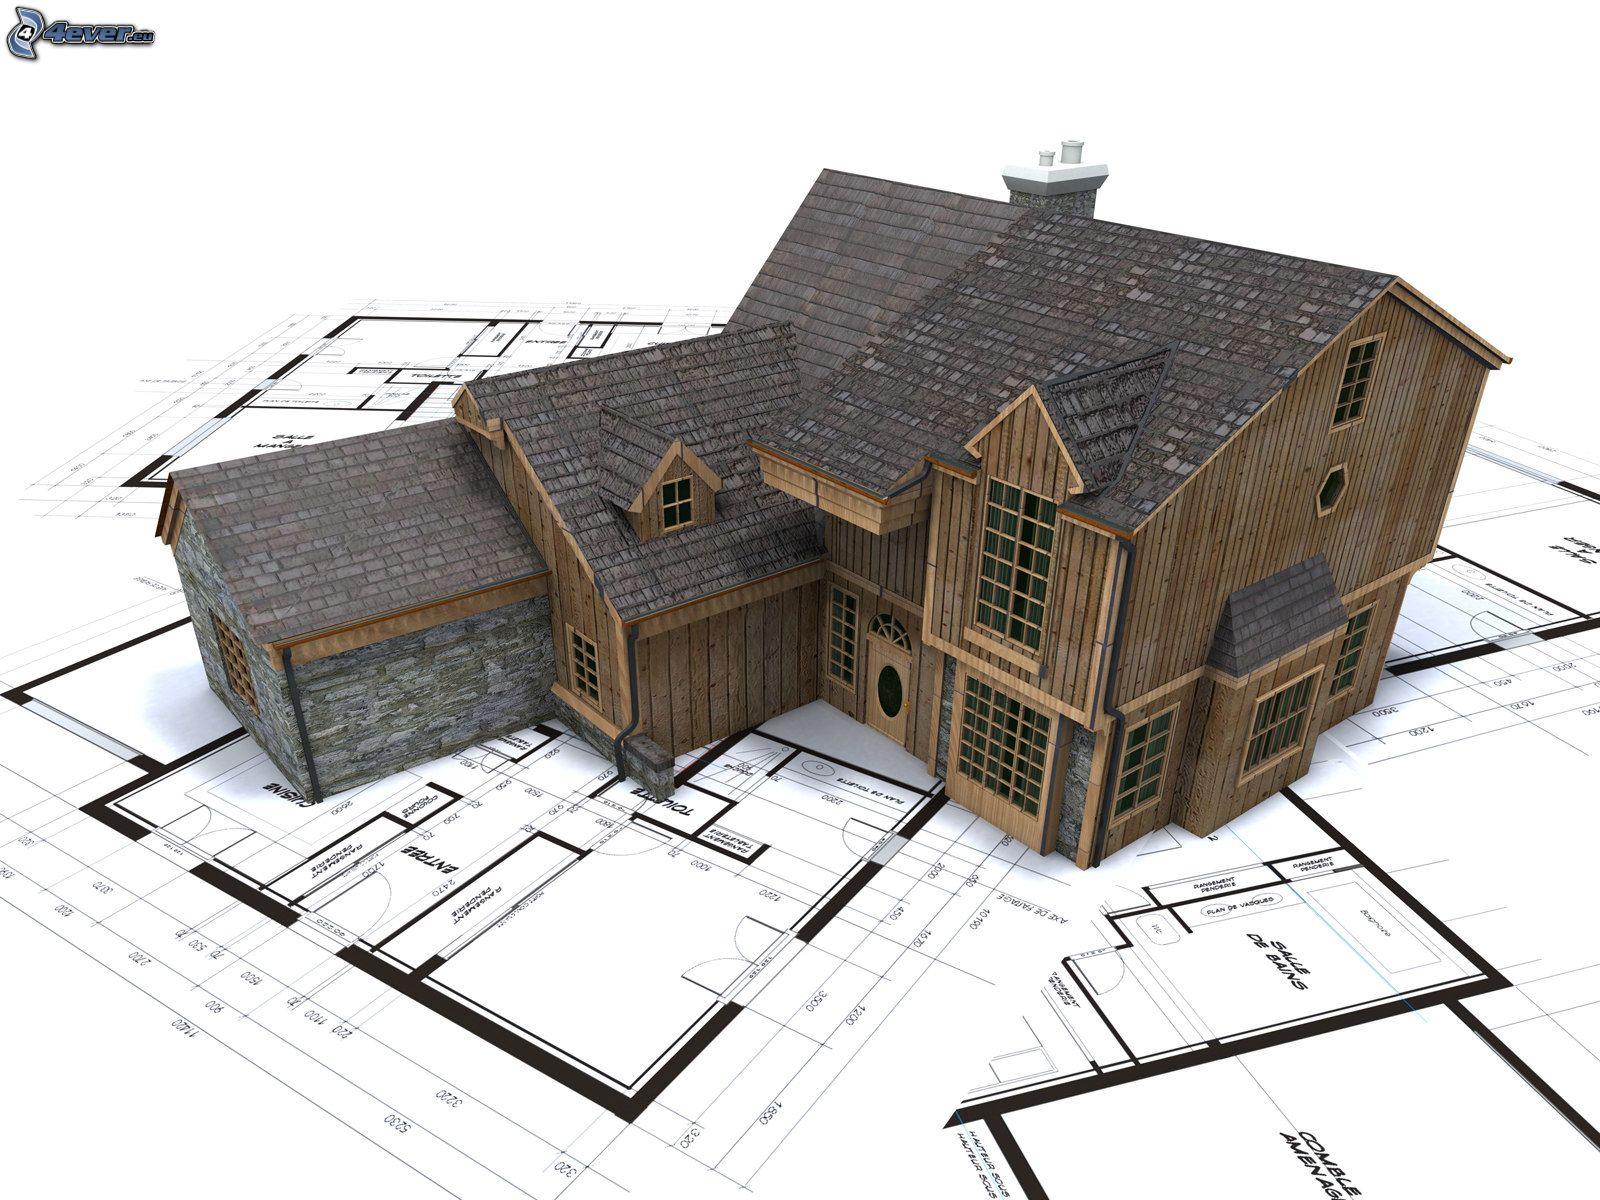 Casa de madera - Casas en miniatura de madera ...